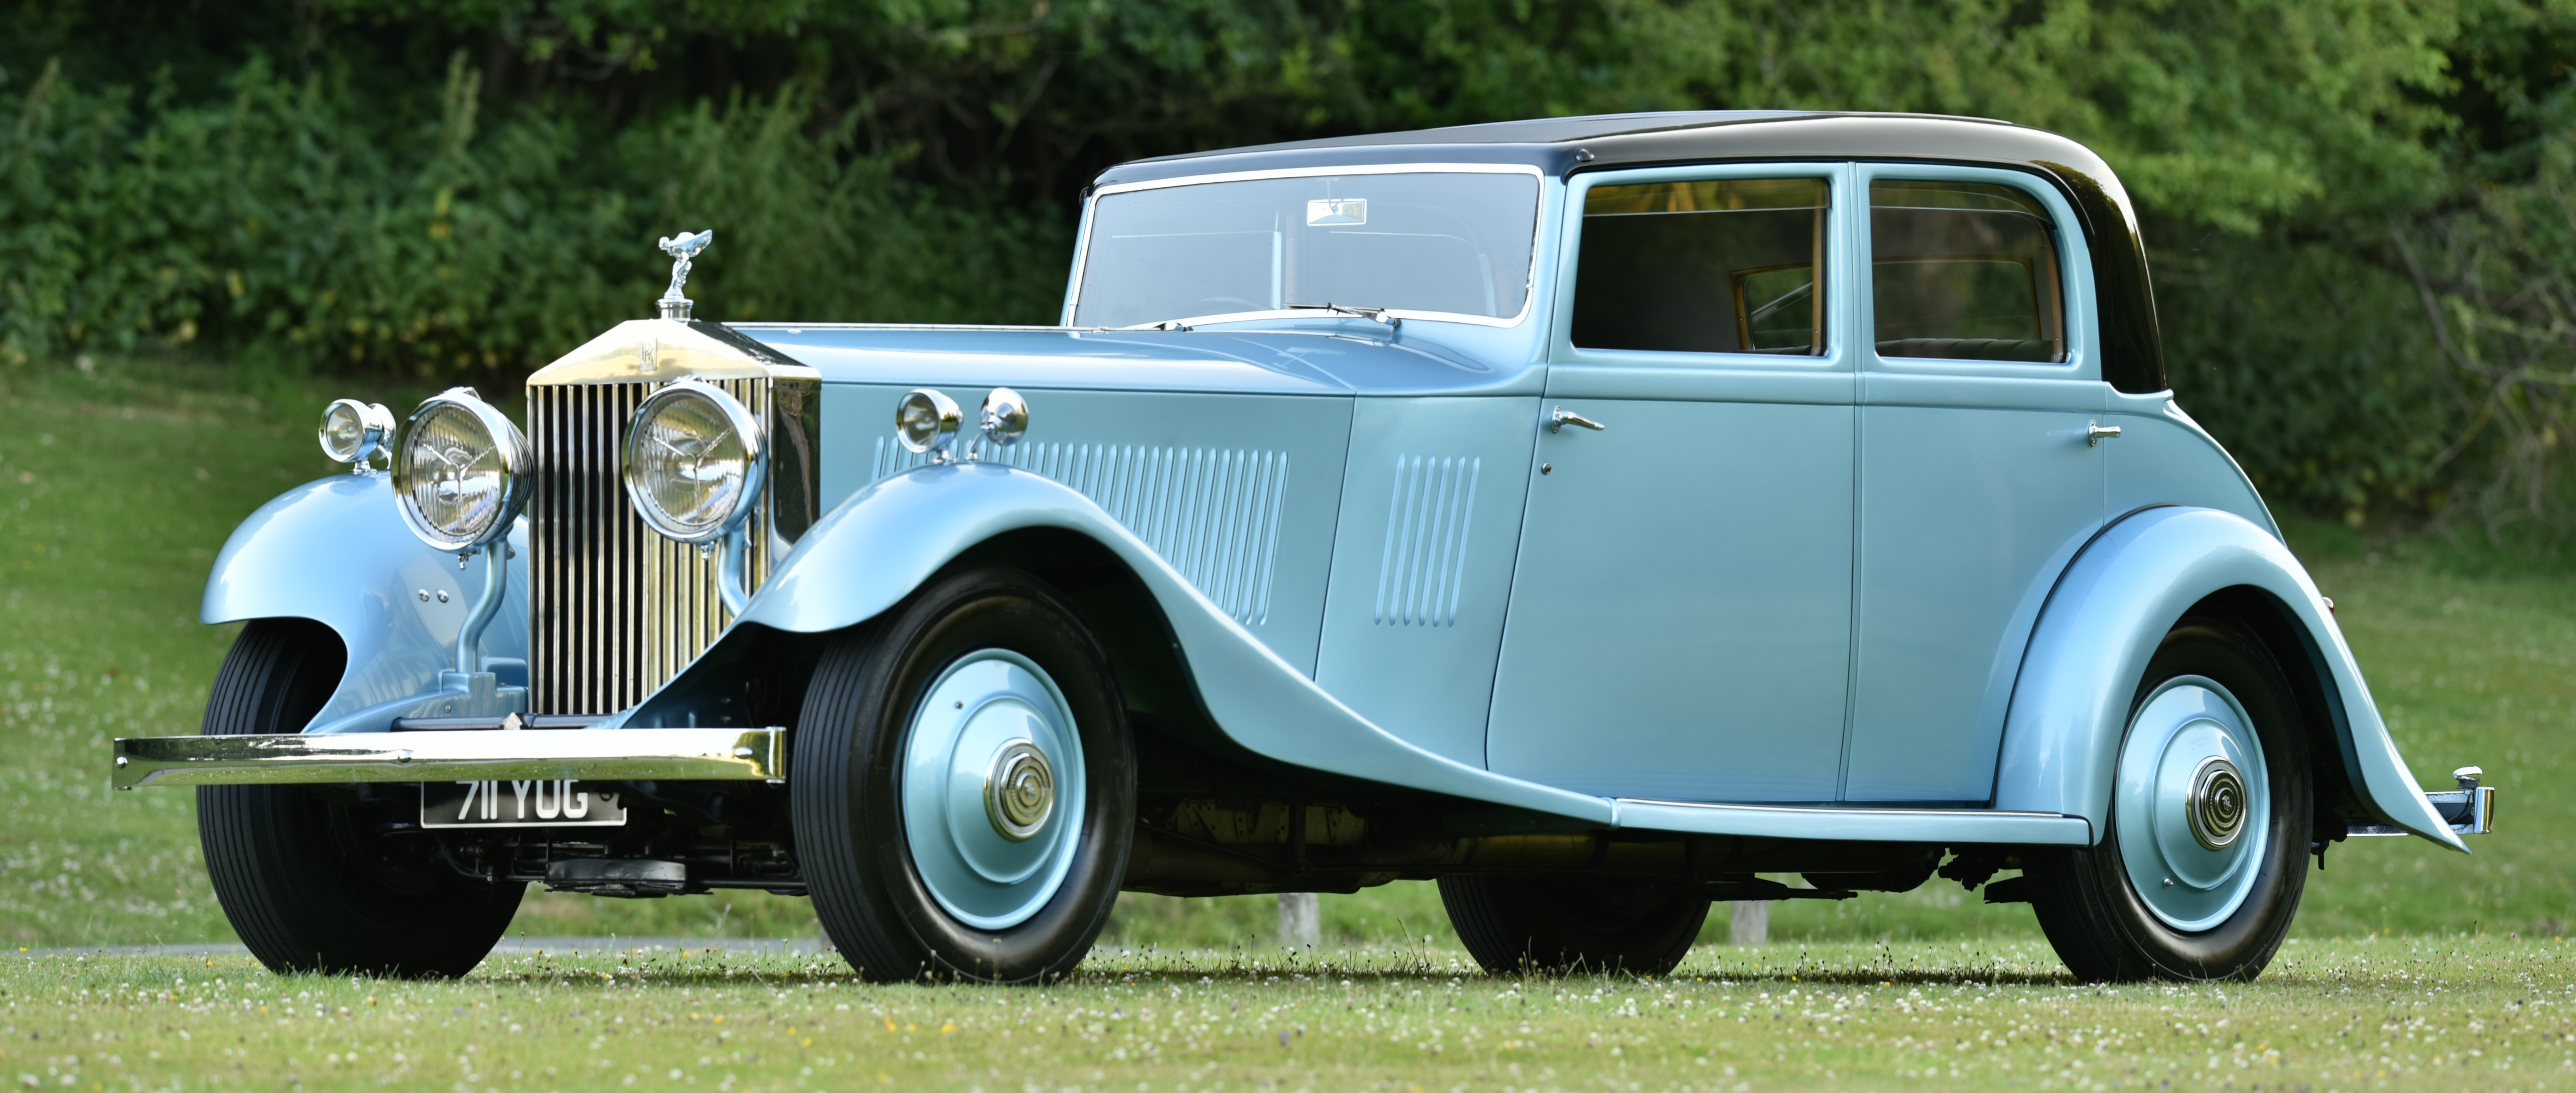 1933 Rolls_Royce_Phantom_II_Continental_711YUG_5